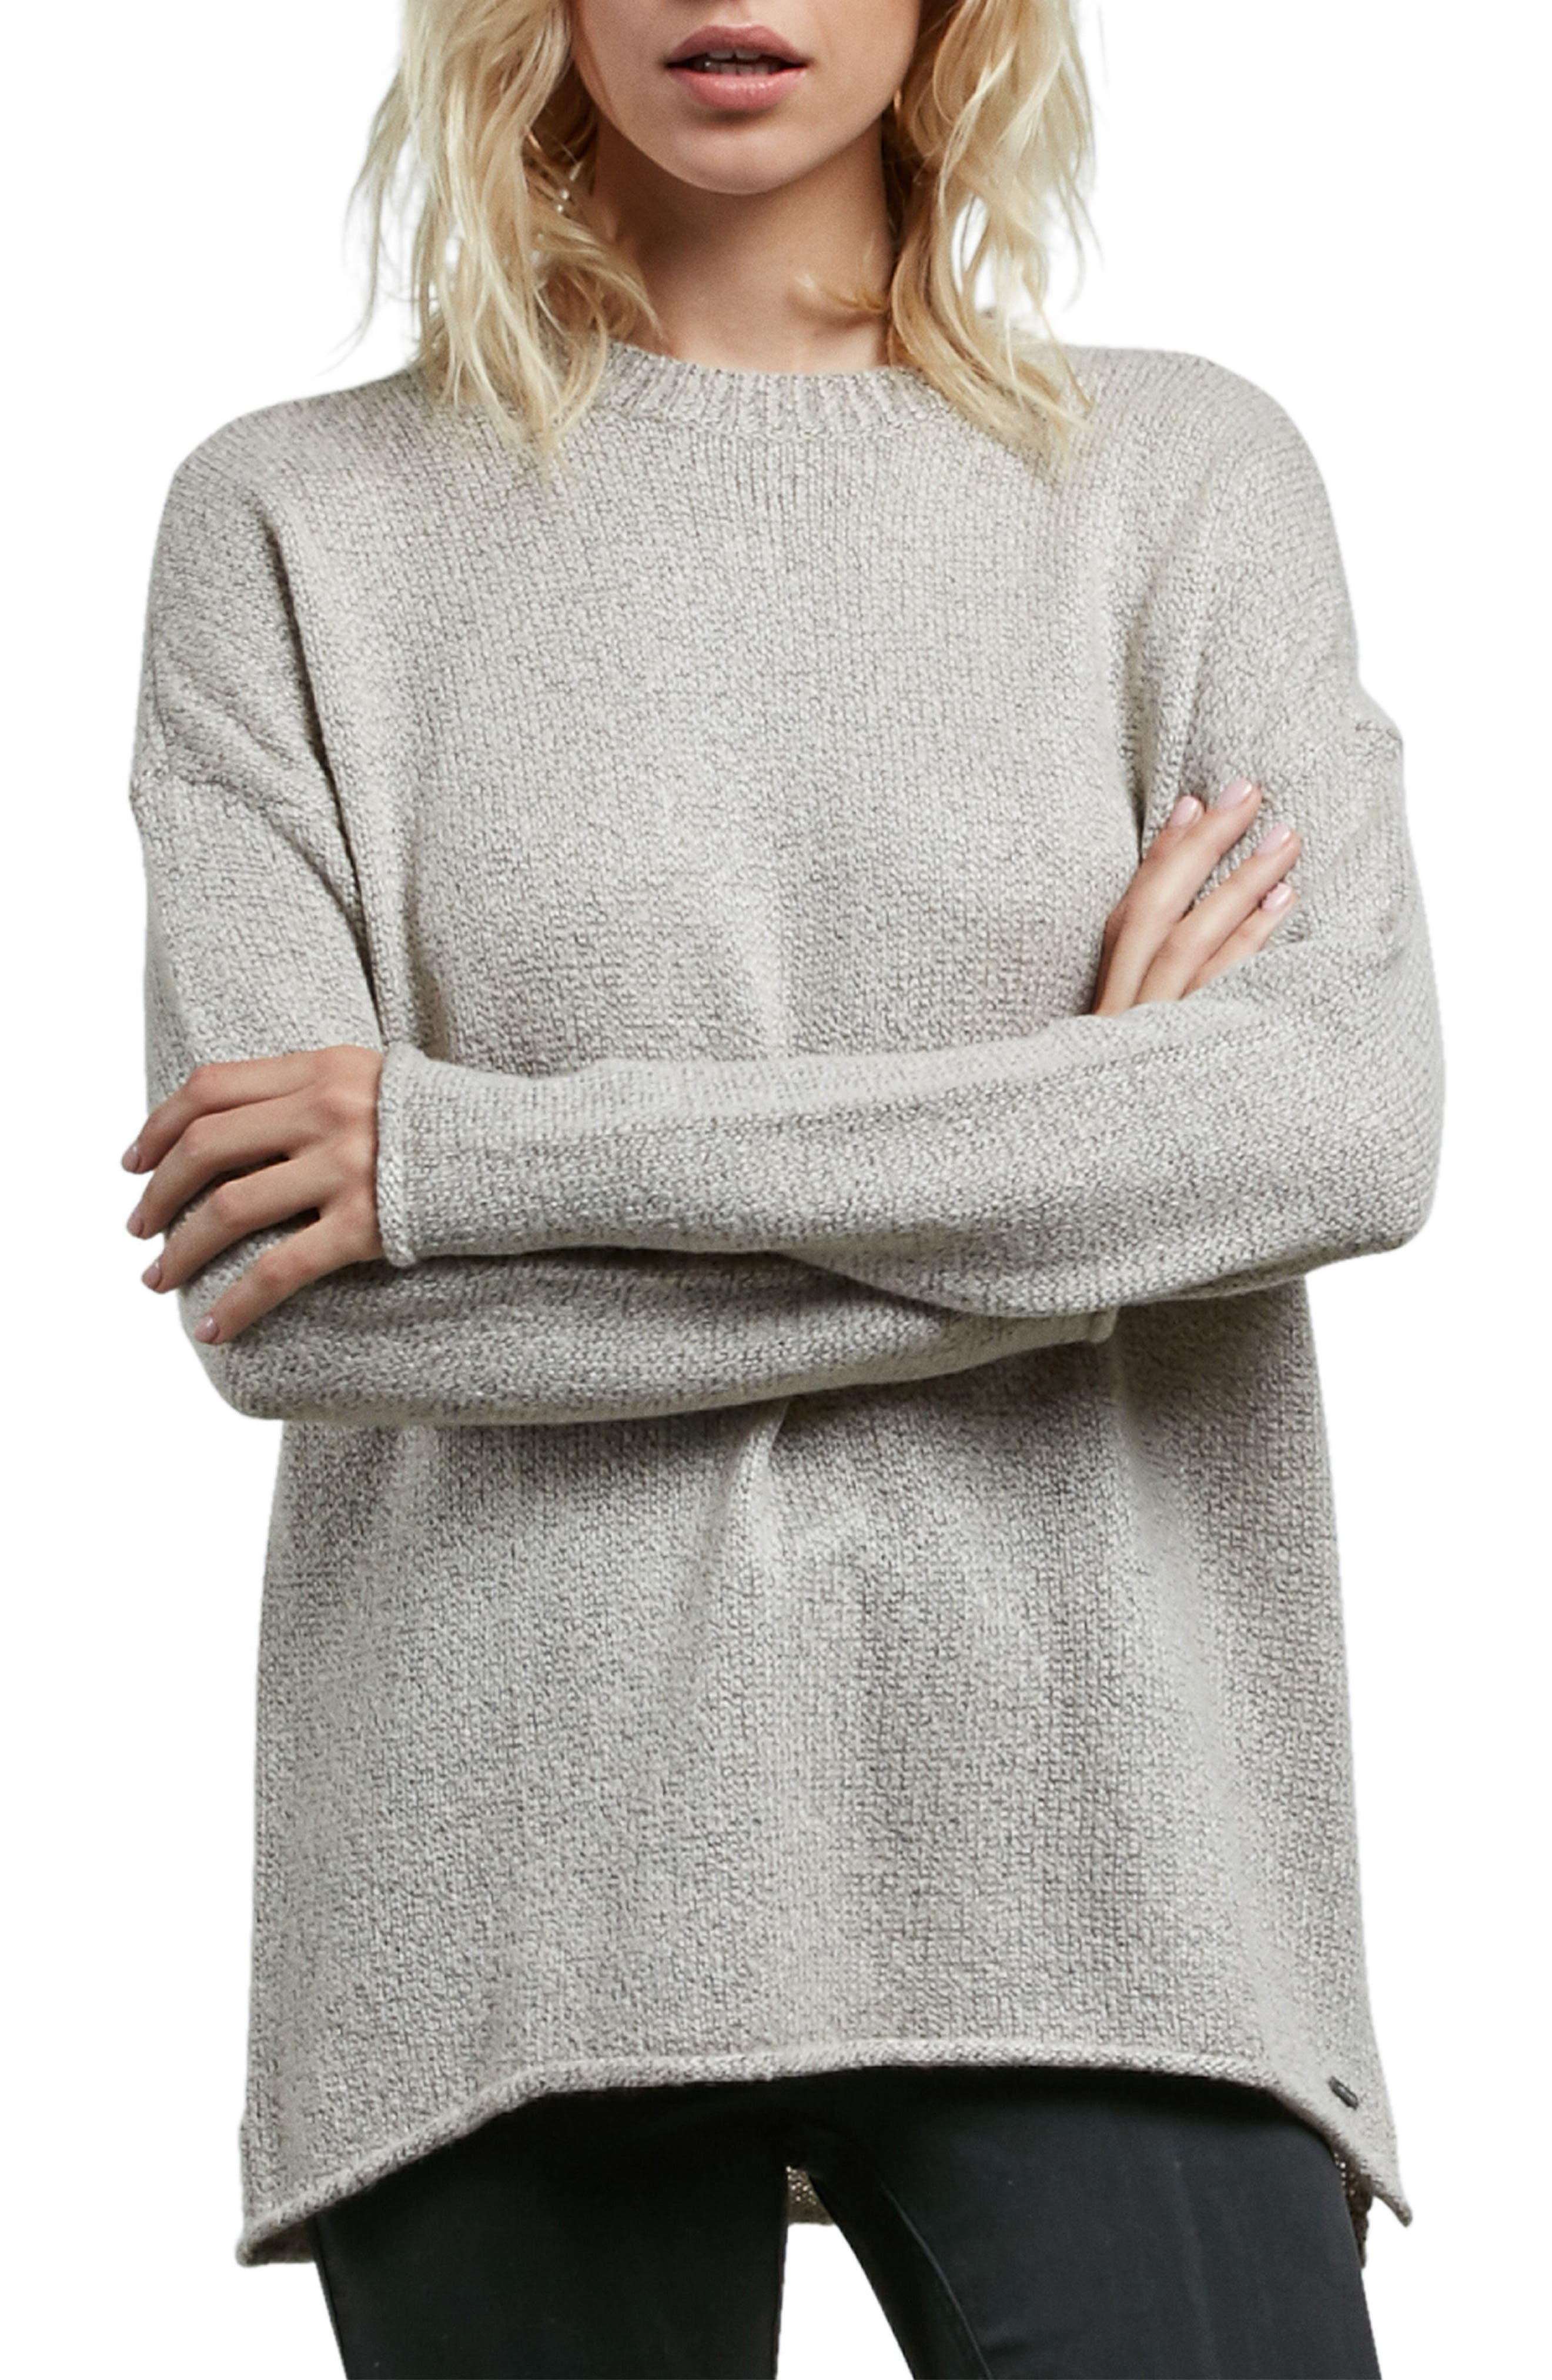 Yarn Moji Sweater,                             Main thumbnail 1, color,                             054